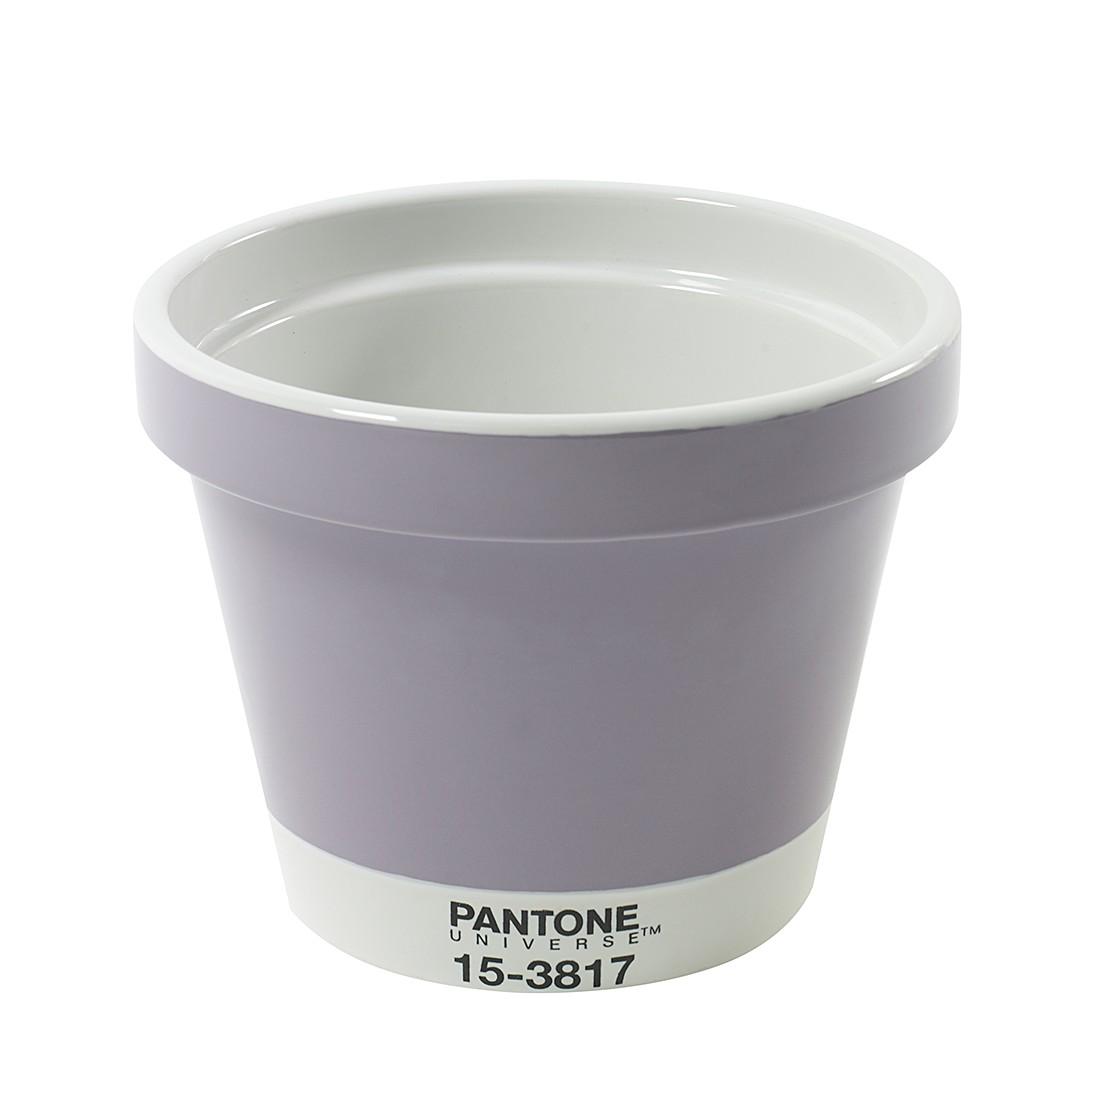 Blumentopf Pantone II – Lila, Pantone kaufen